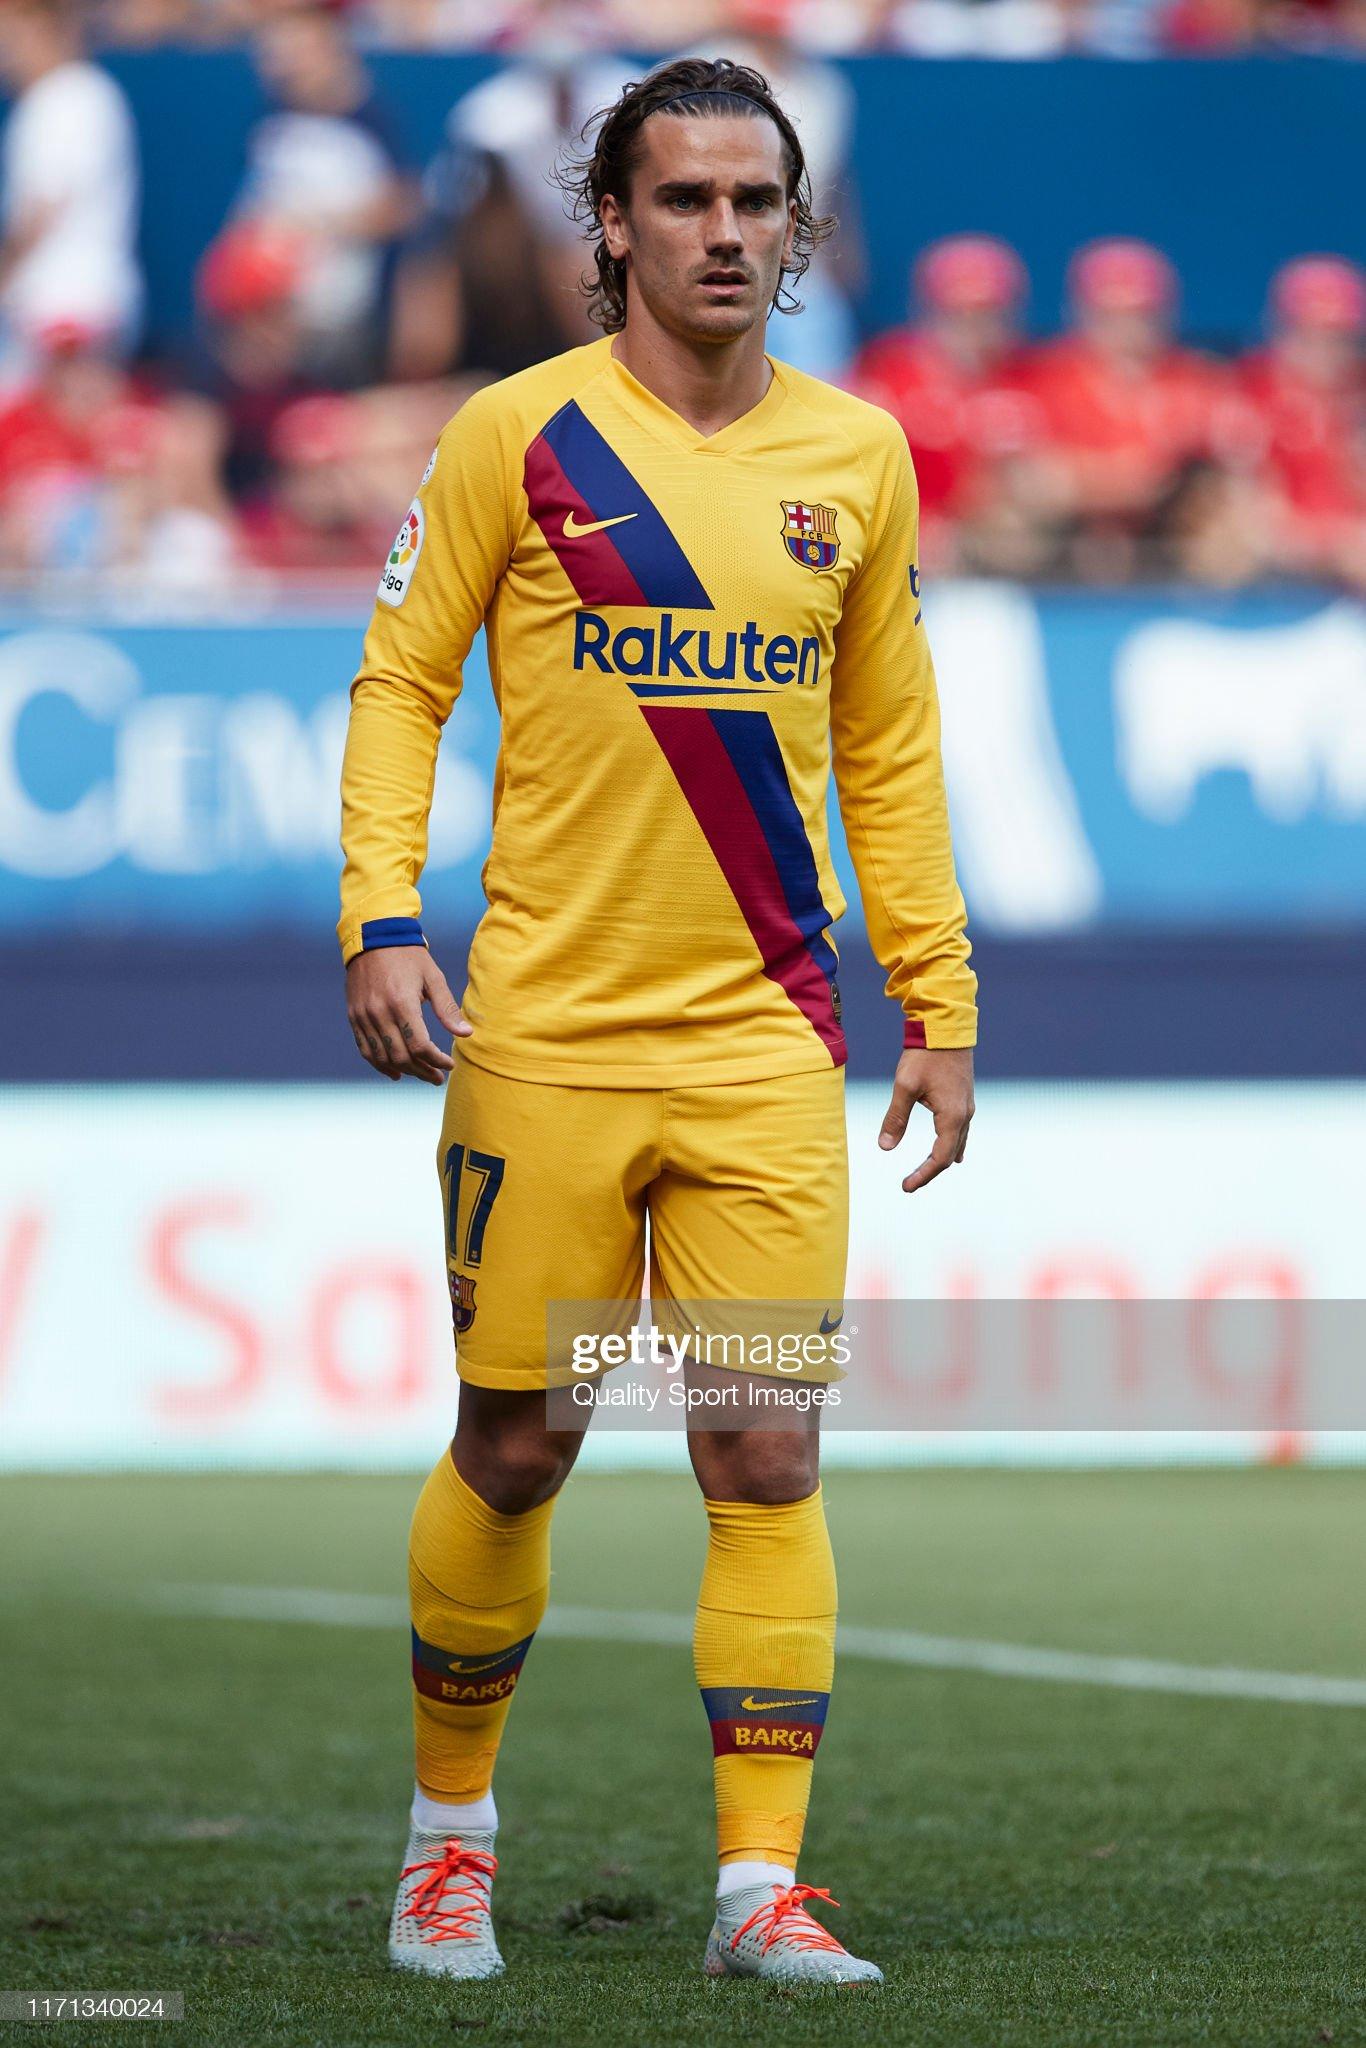 صور مباراة : أوساسونا - برشلونة 2-2 ( 31-08-2019 )  Antoine-griezmann-of-fc-barcelona-looks-on-during-the-liga-match-ca-picture-id1171340024?s=2048x2048